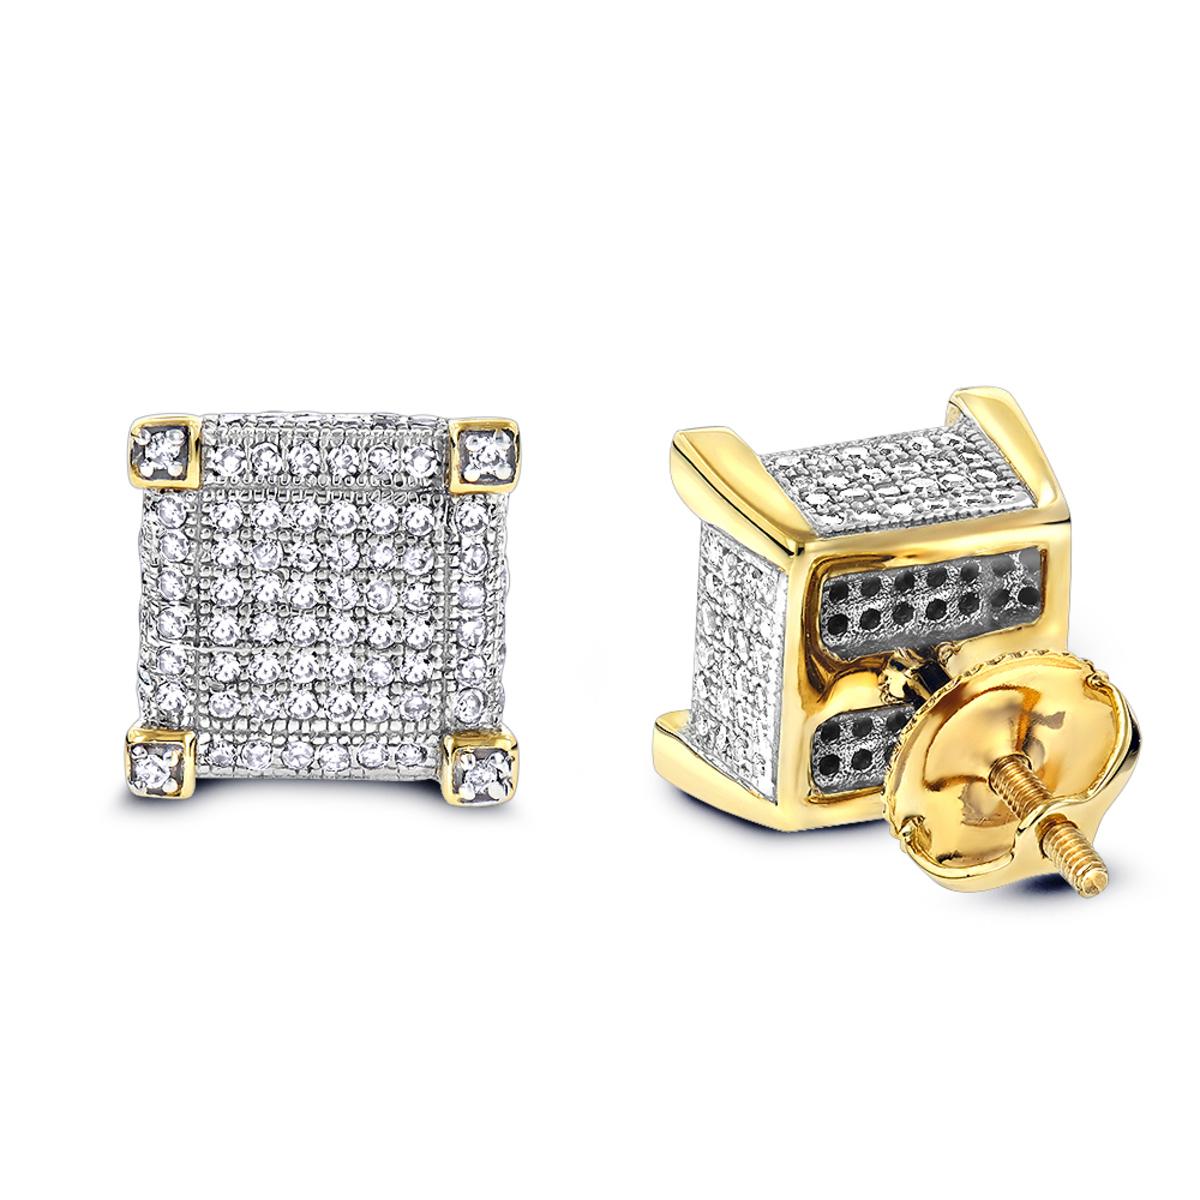 Real Diamond Earrings 14K Diamond Stud Earrings 0.7